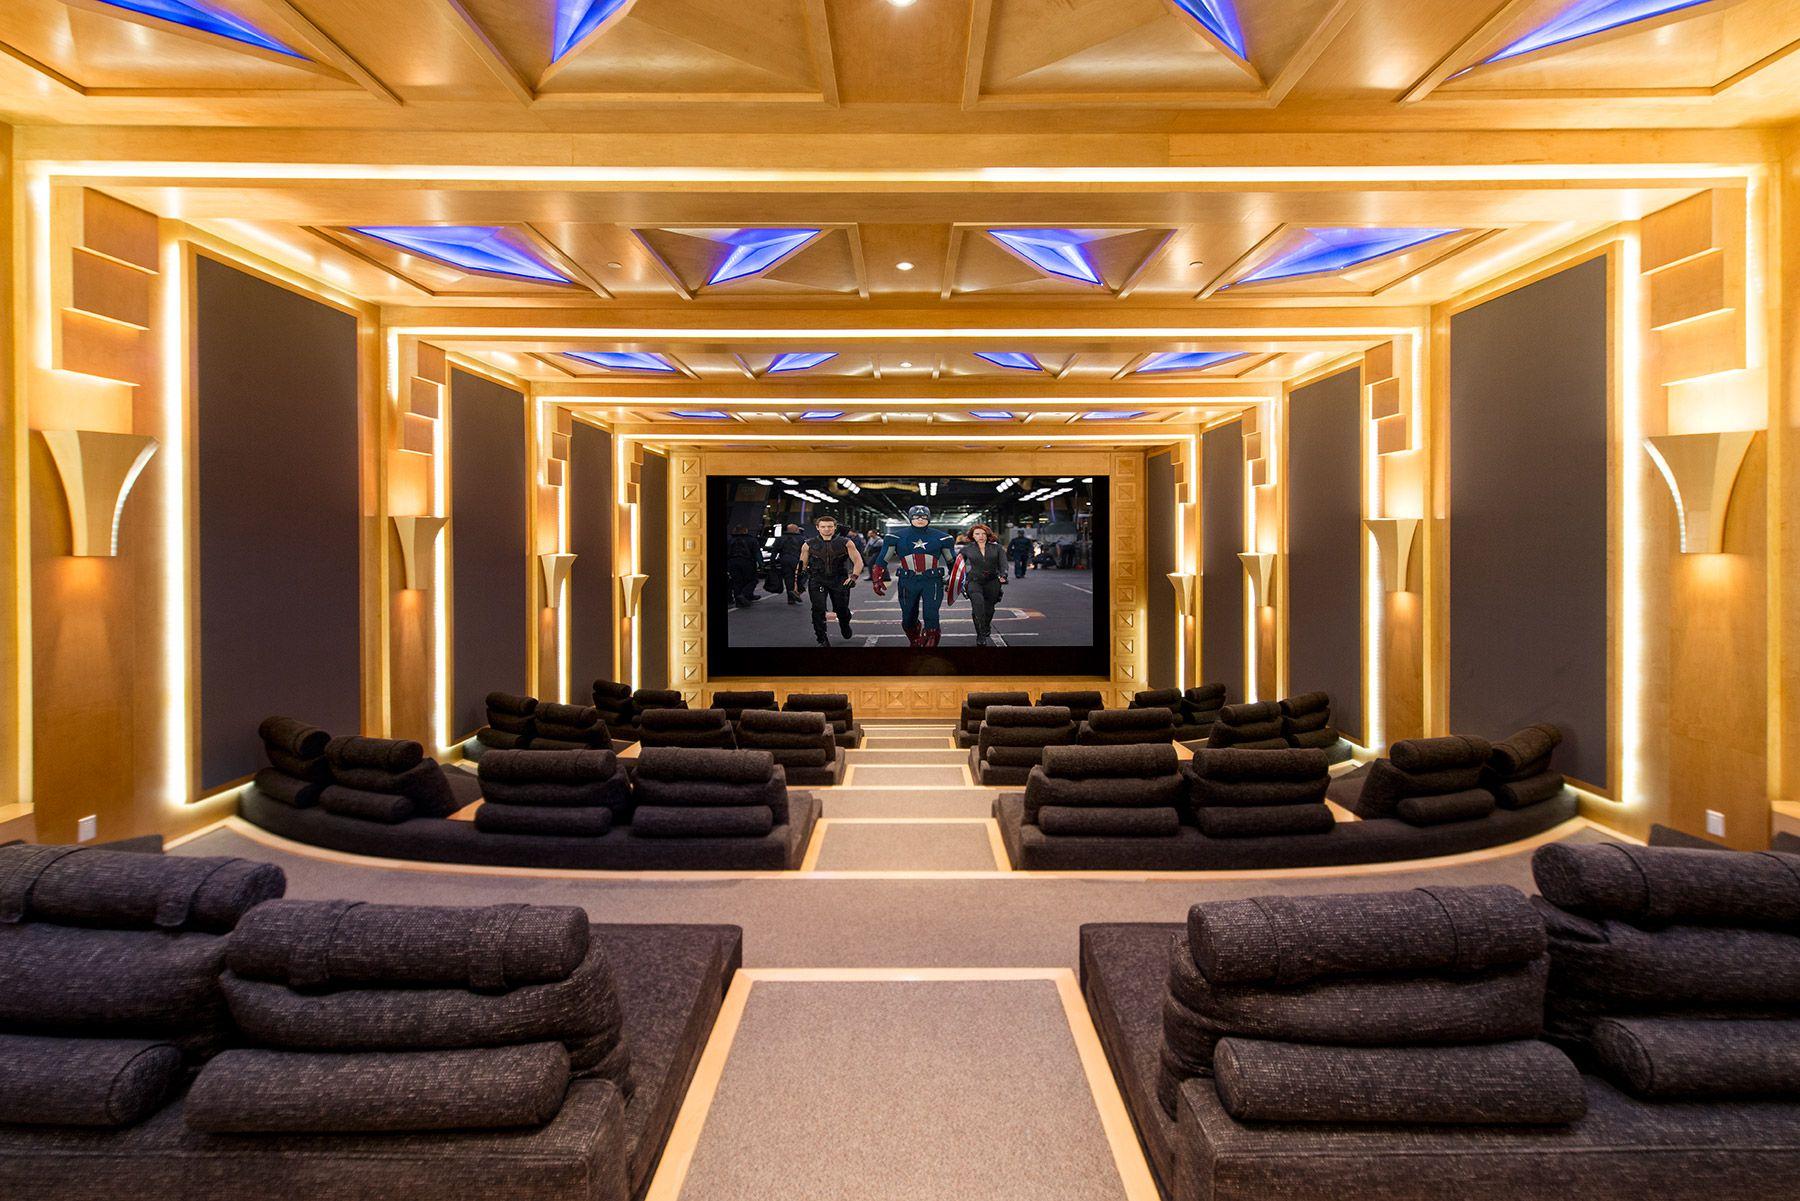 Beverly hills luxury home theatre